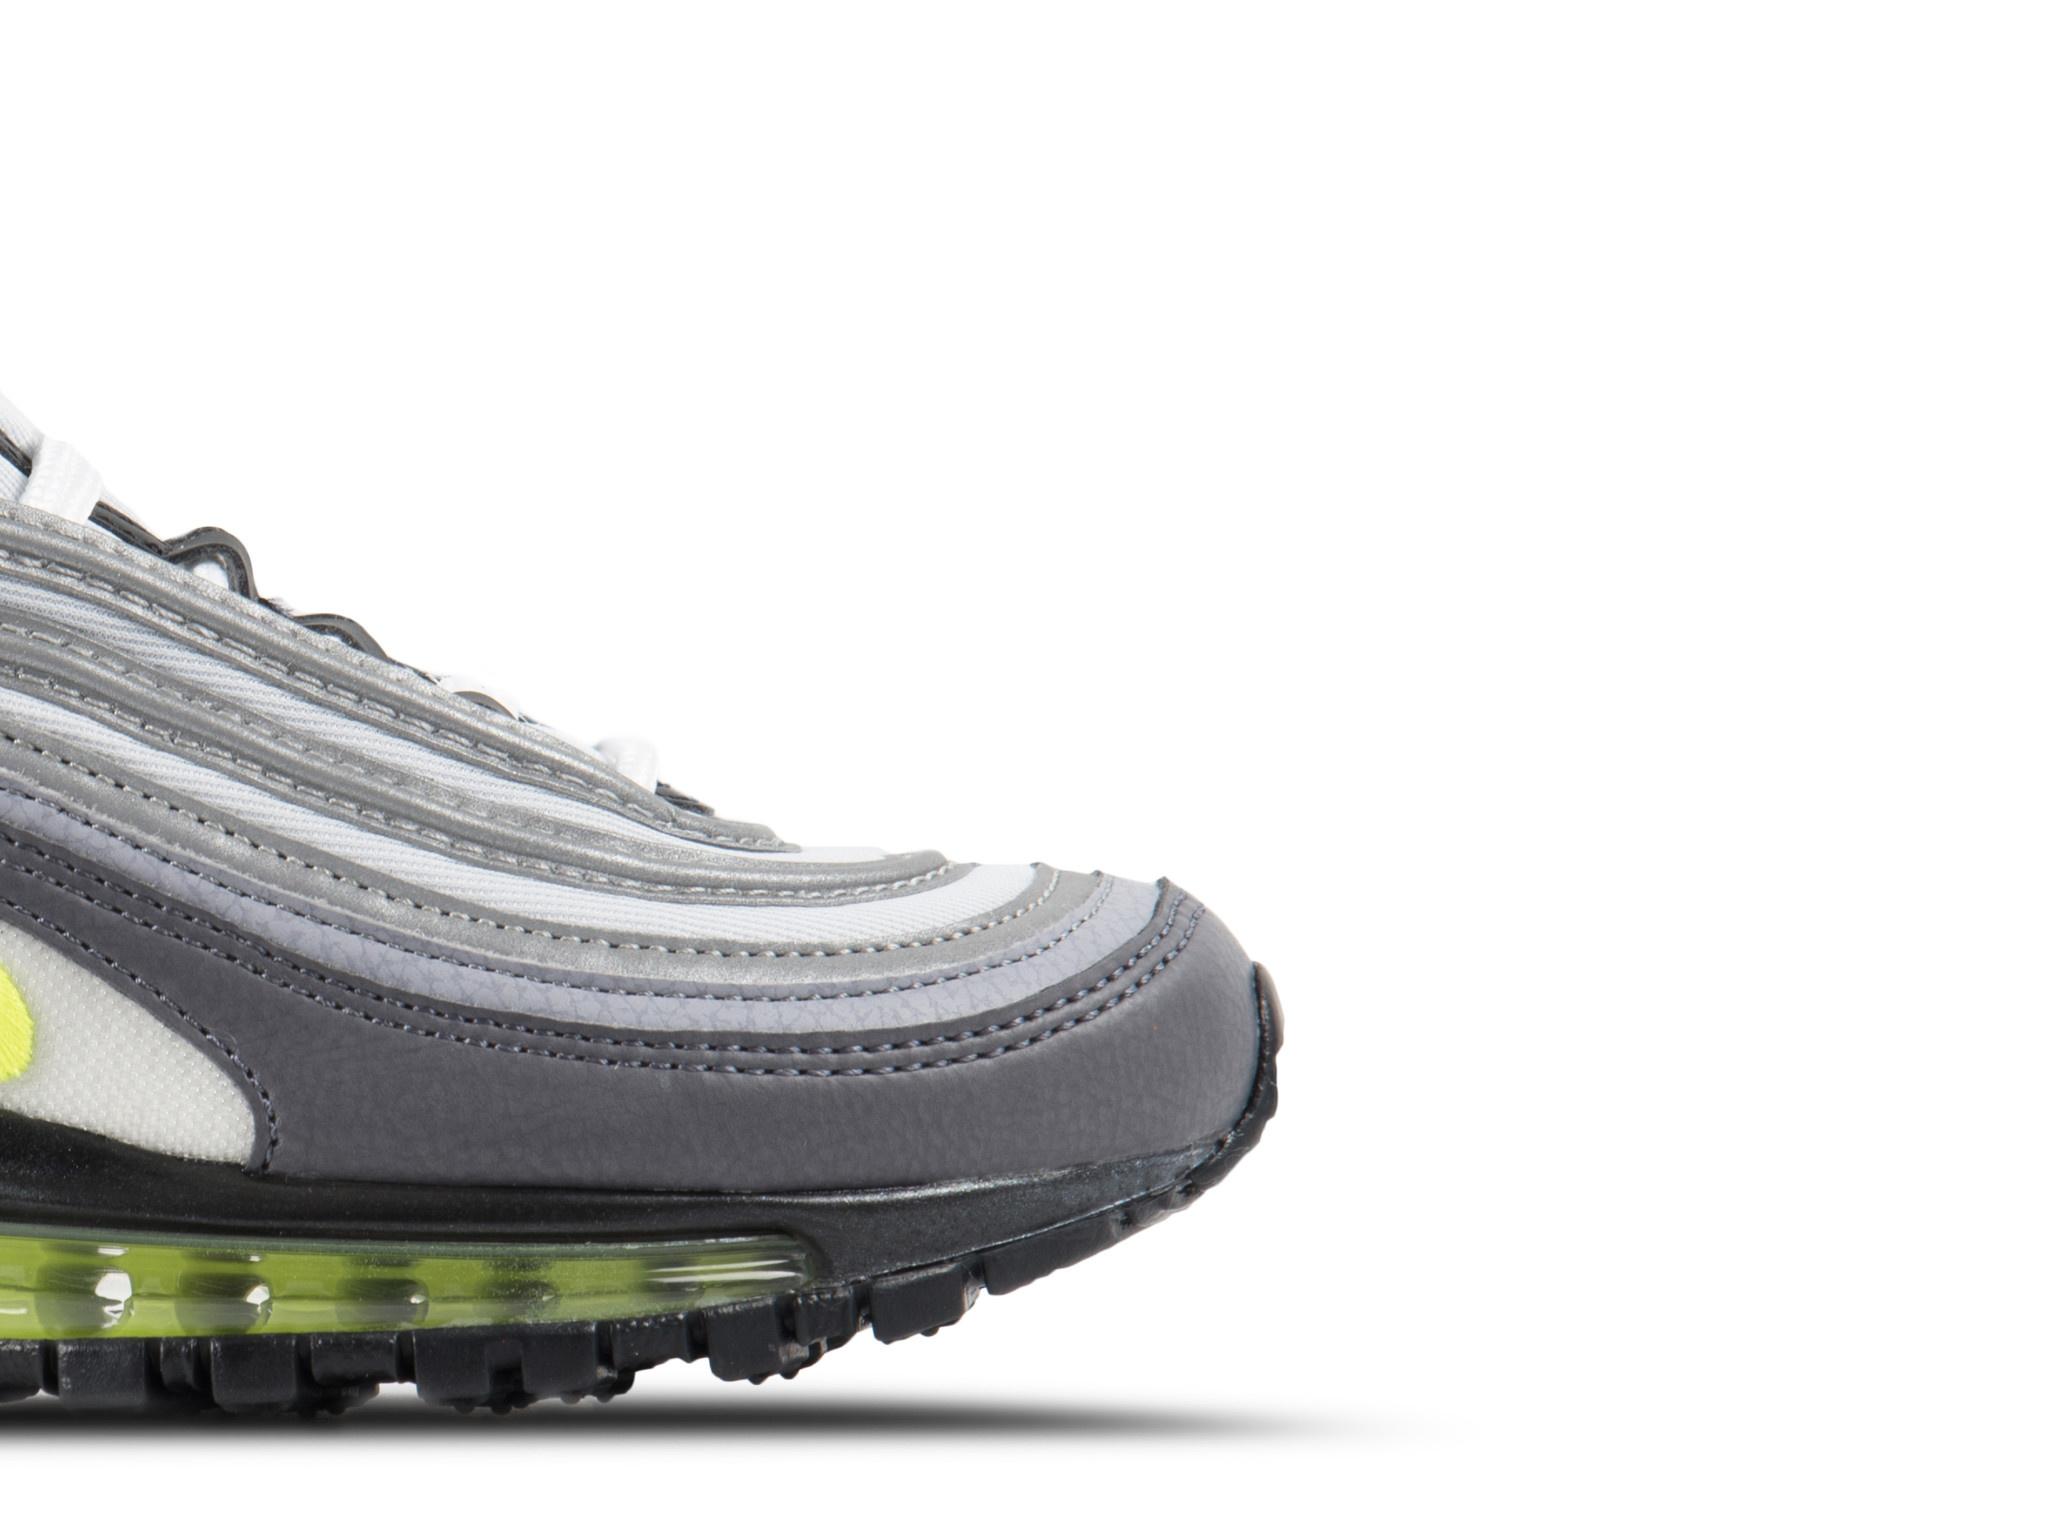 Nike W Air Max 97 Dark Grey Volt Stealth Pure Platinum 921733 003